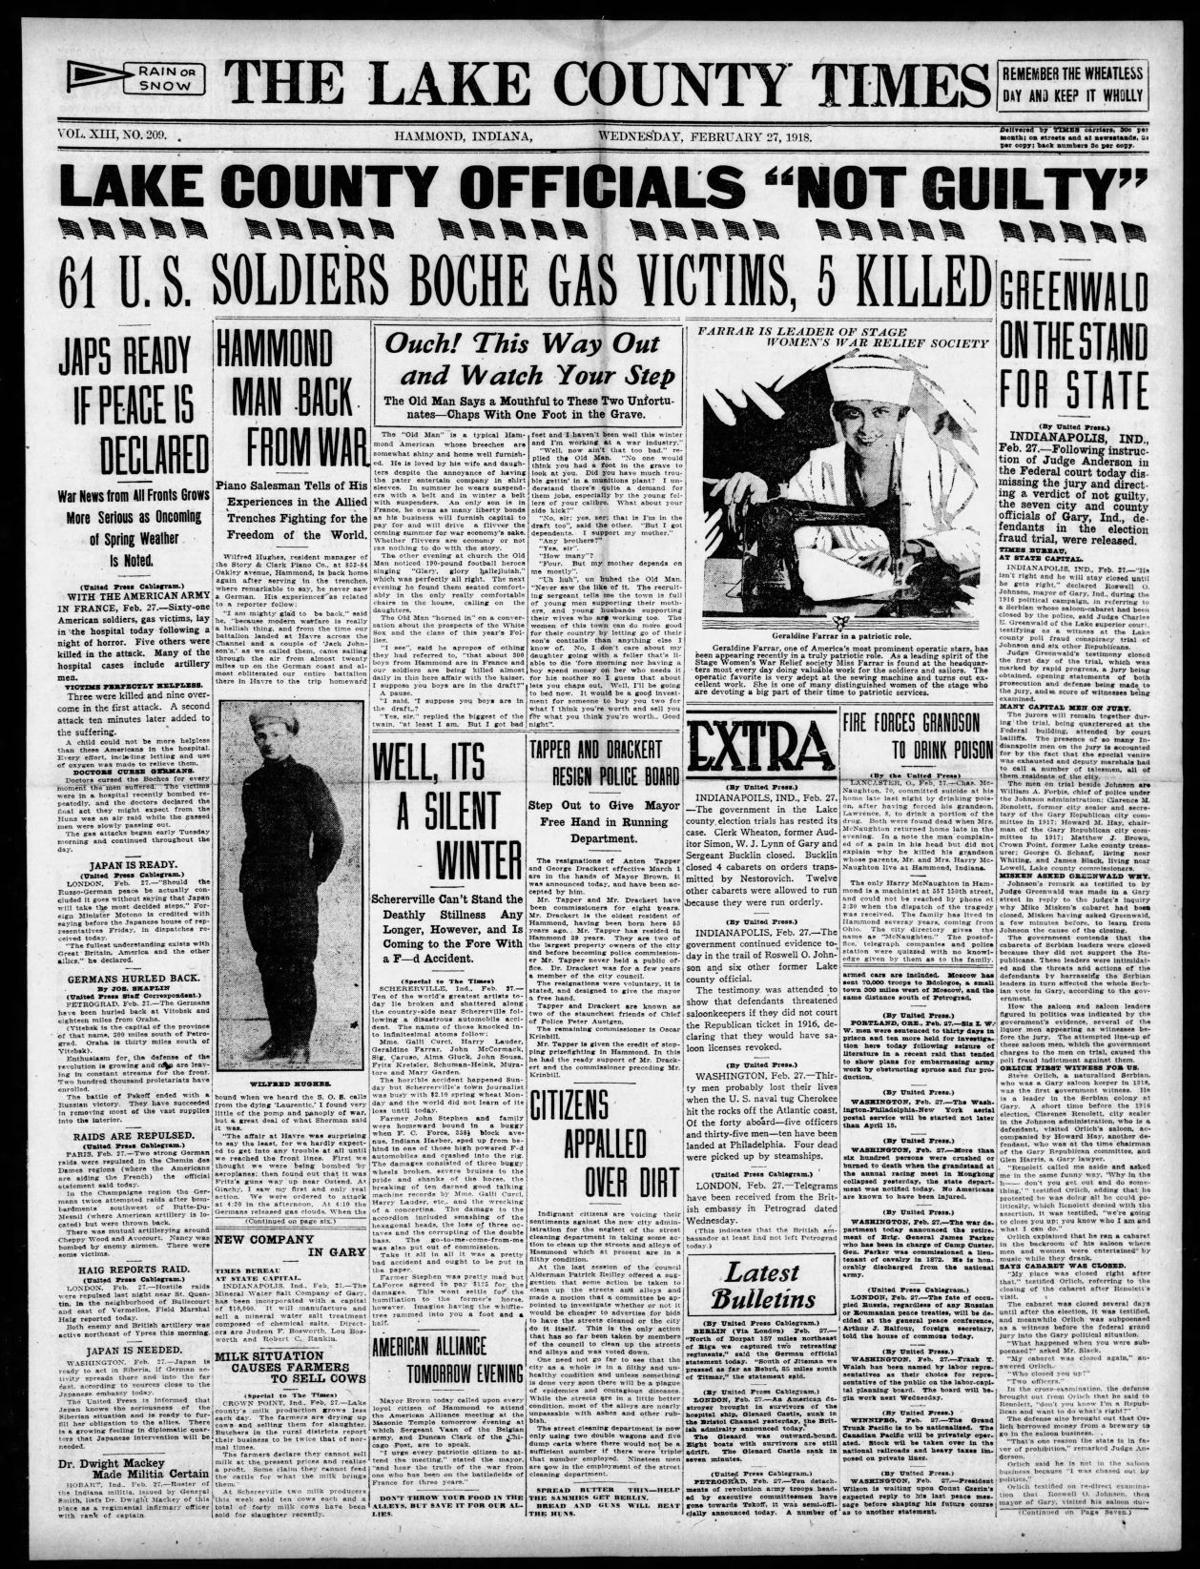 Feb. 27, 1918: 61 U.S. Soldiers Boche Gas Victims, 5 Killed